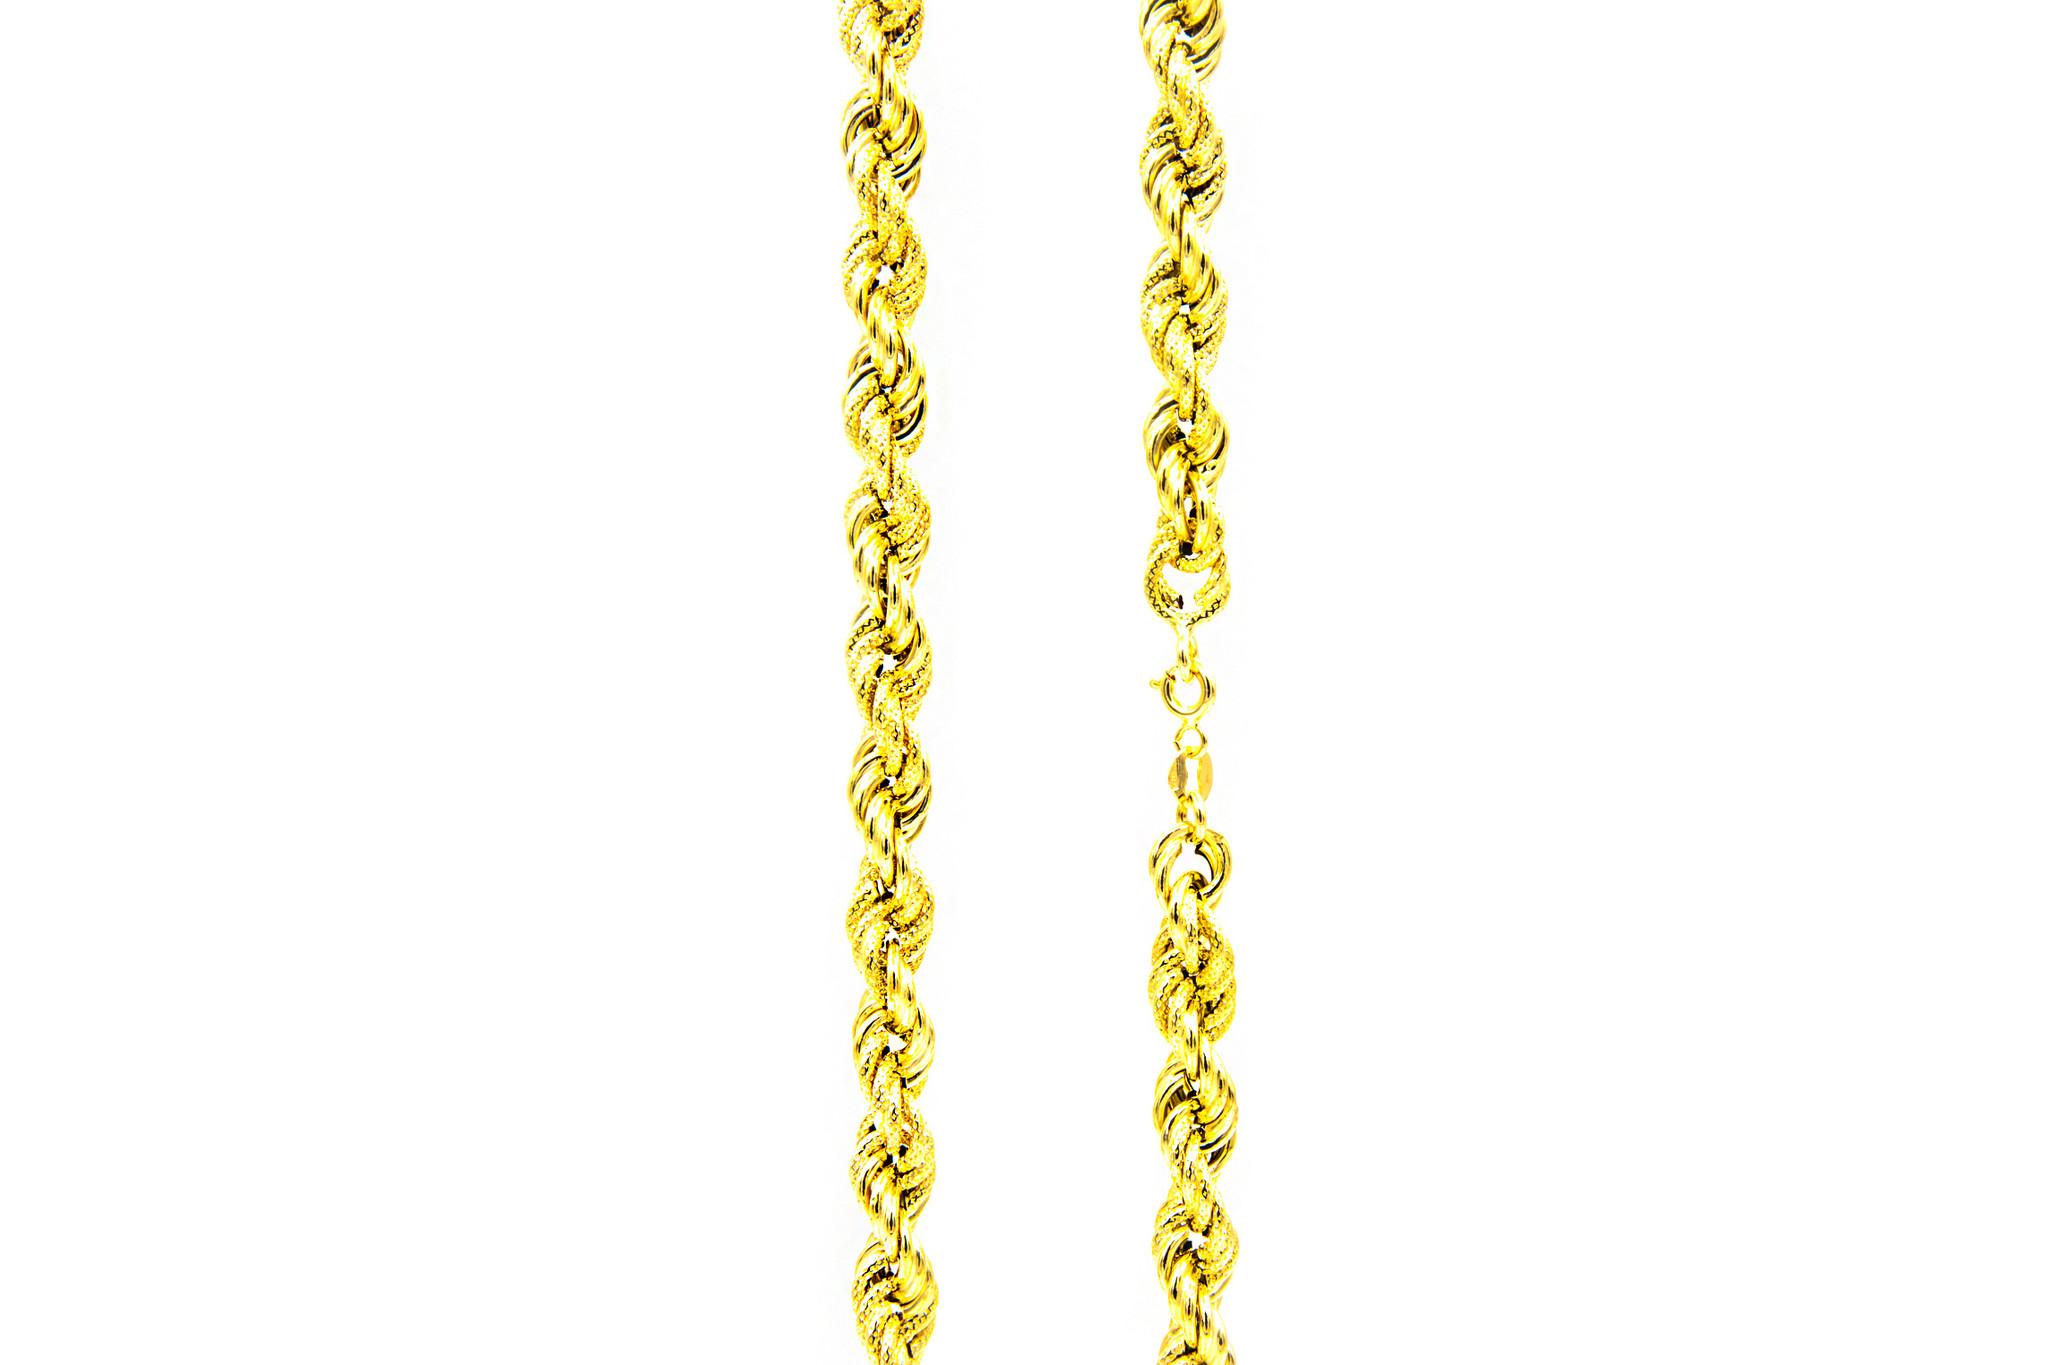 Ketting rope chain gedeeltelijk diamond cut-1